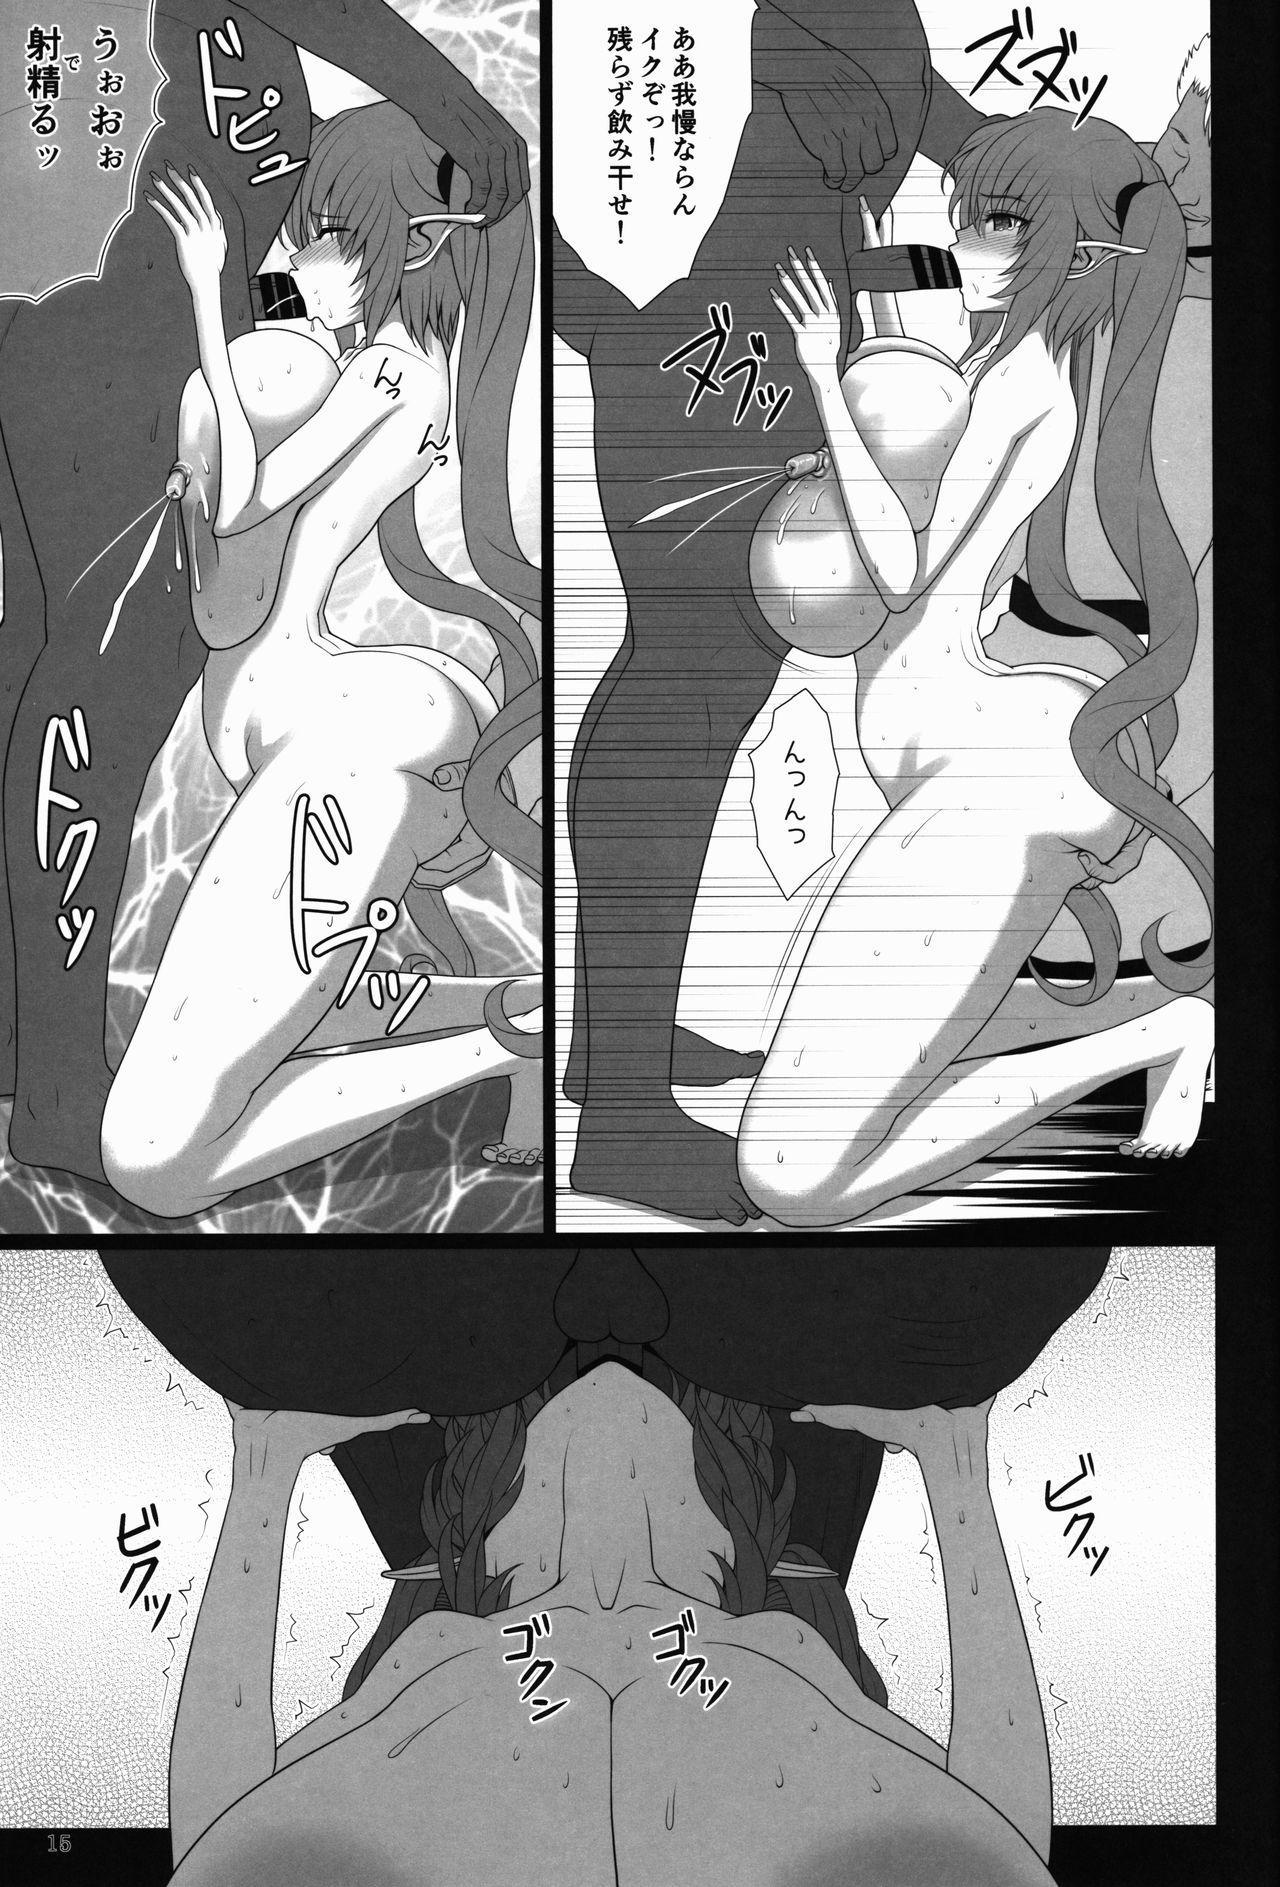 El toiu Shoujo no Monogatari X7 14